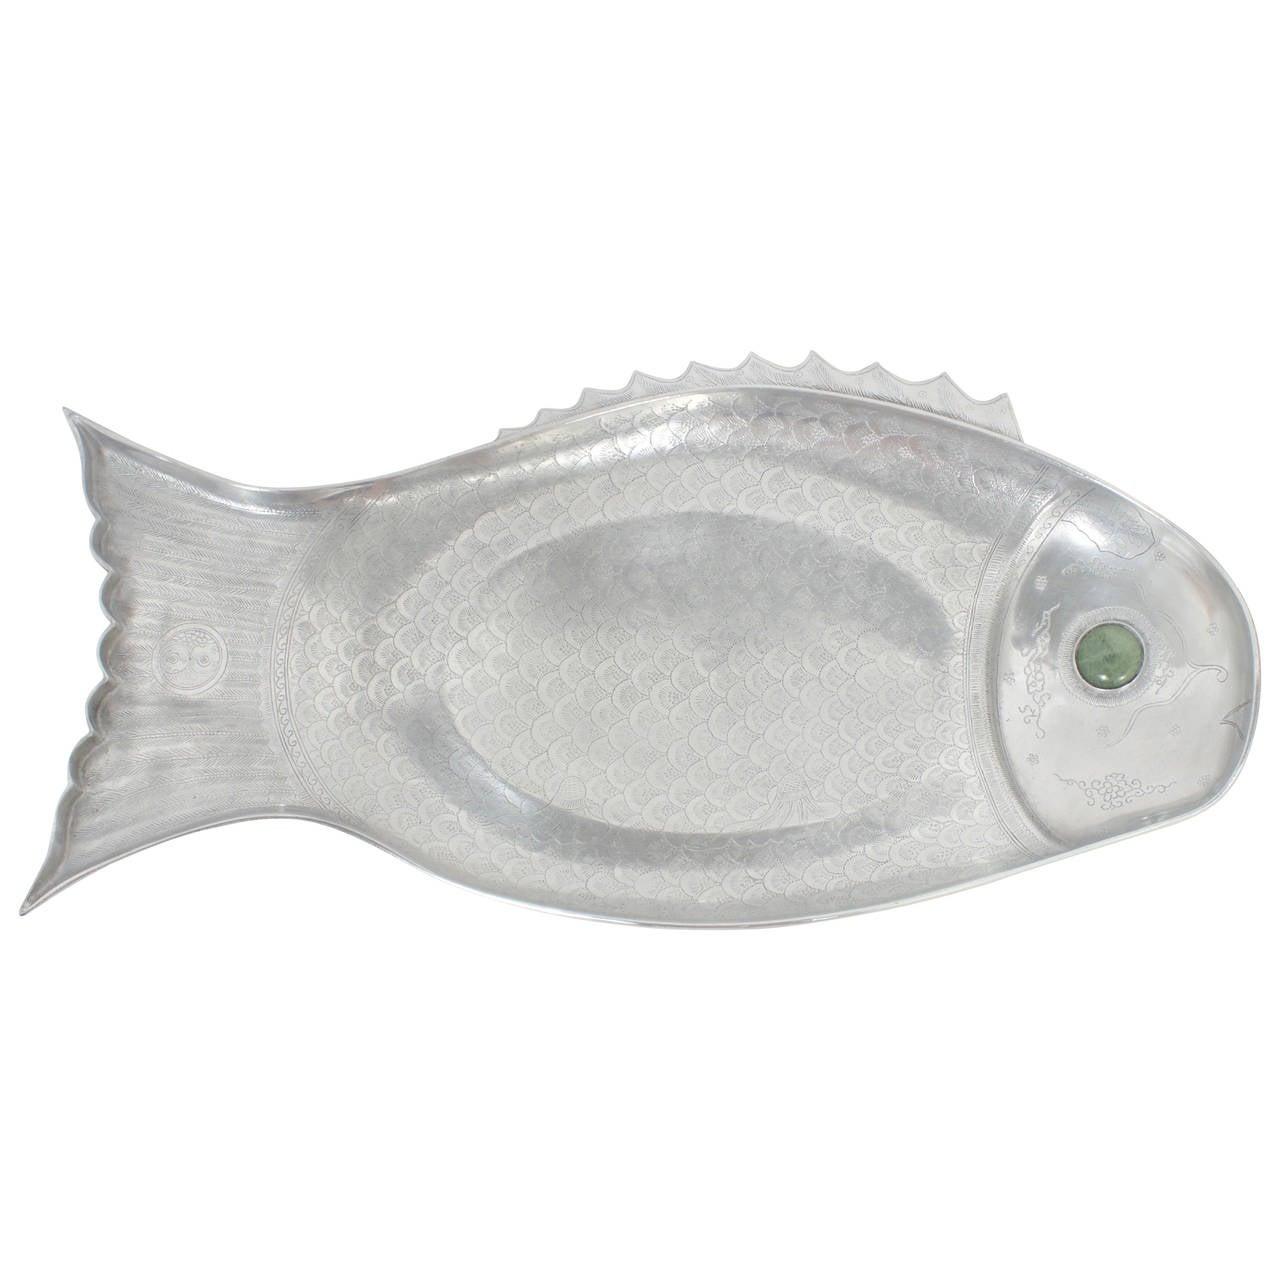 Arthur Court Fish Tray